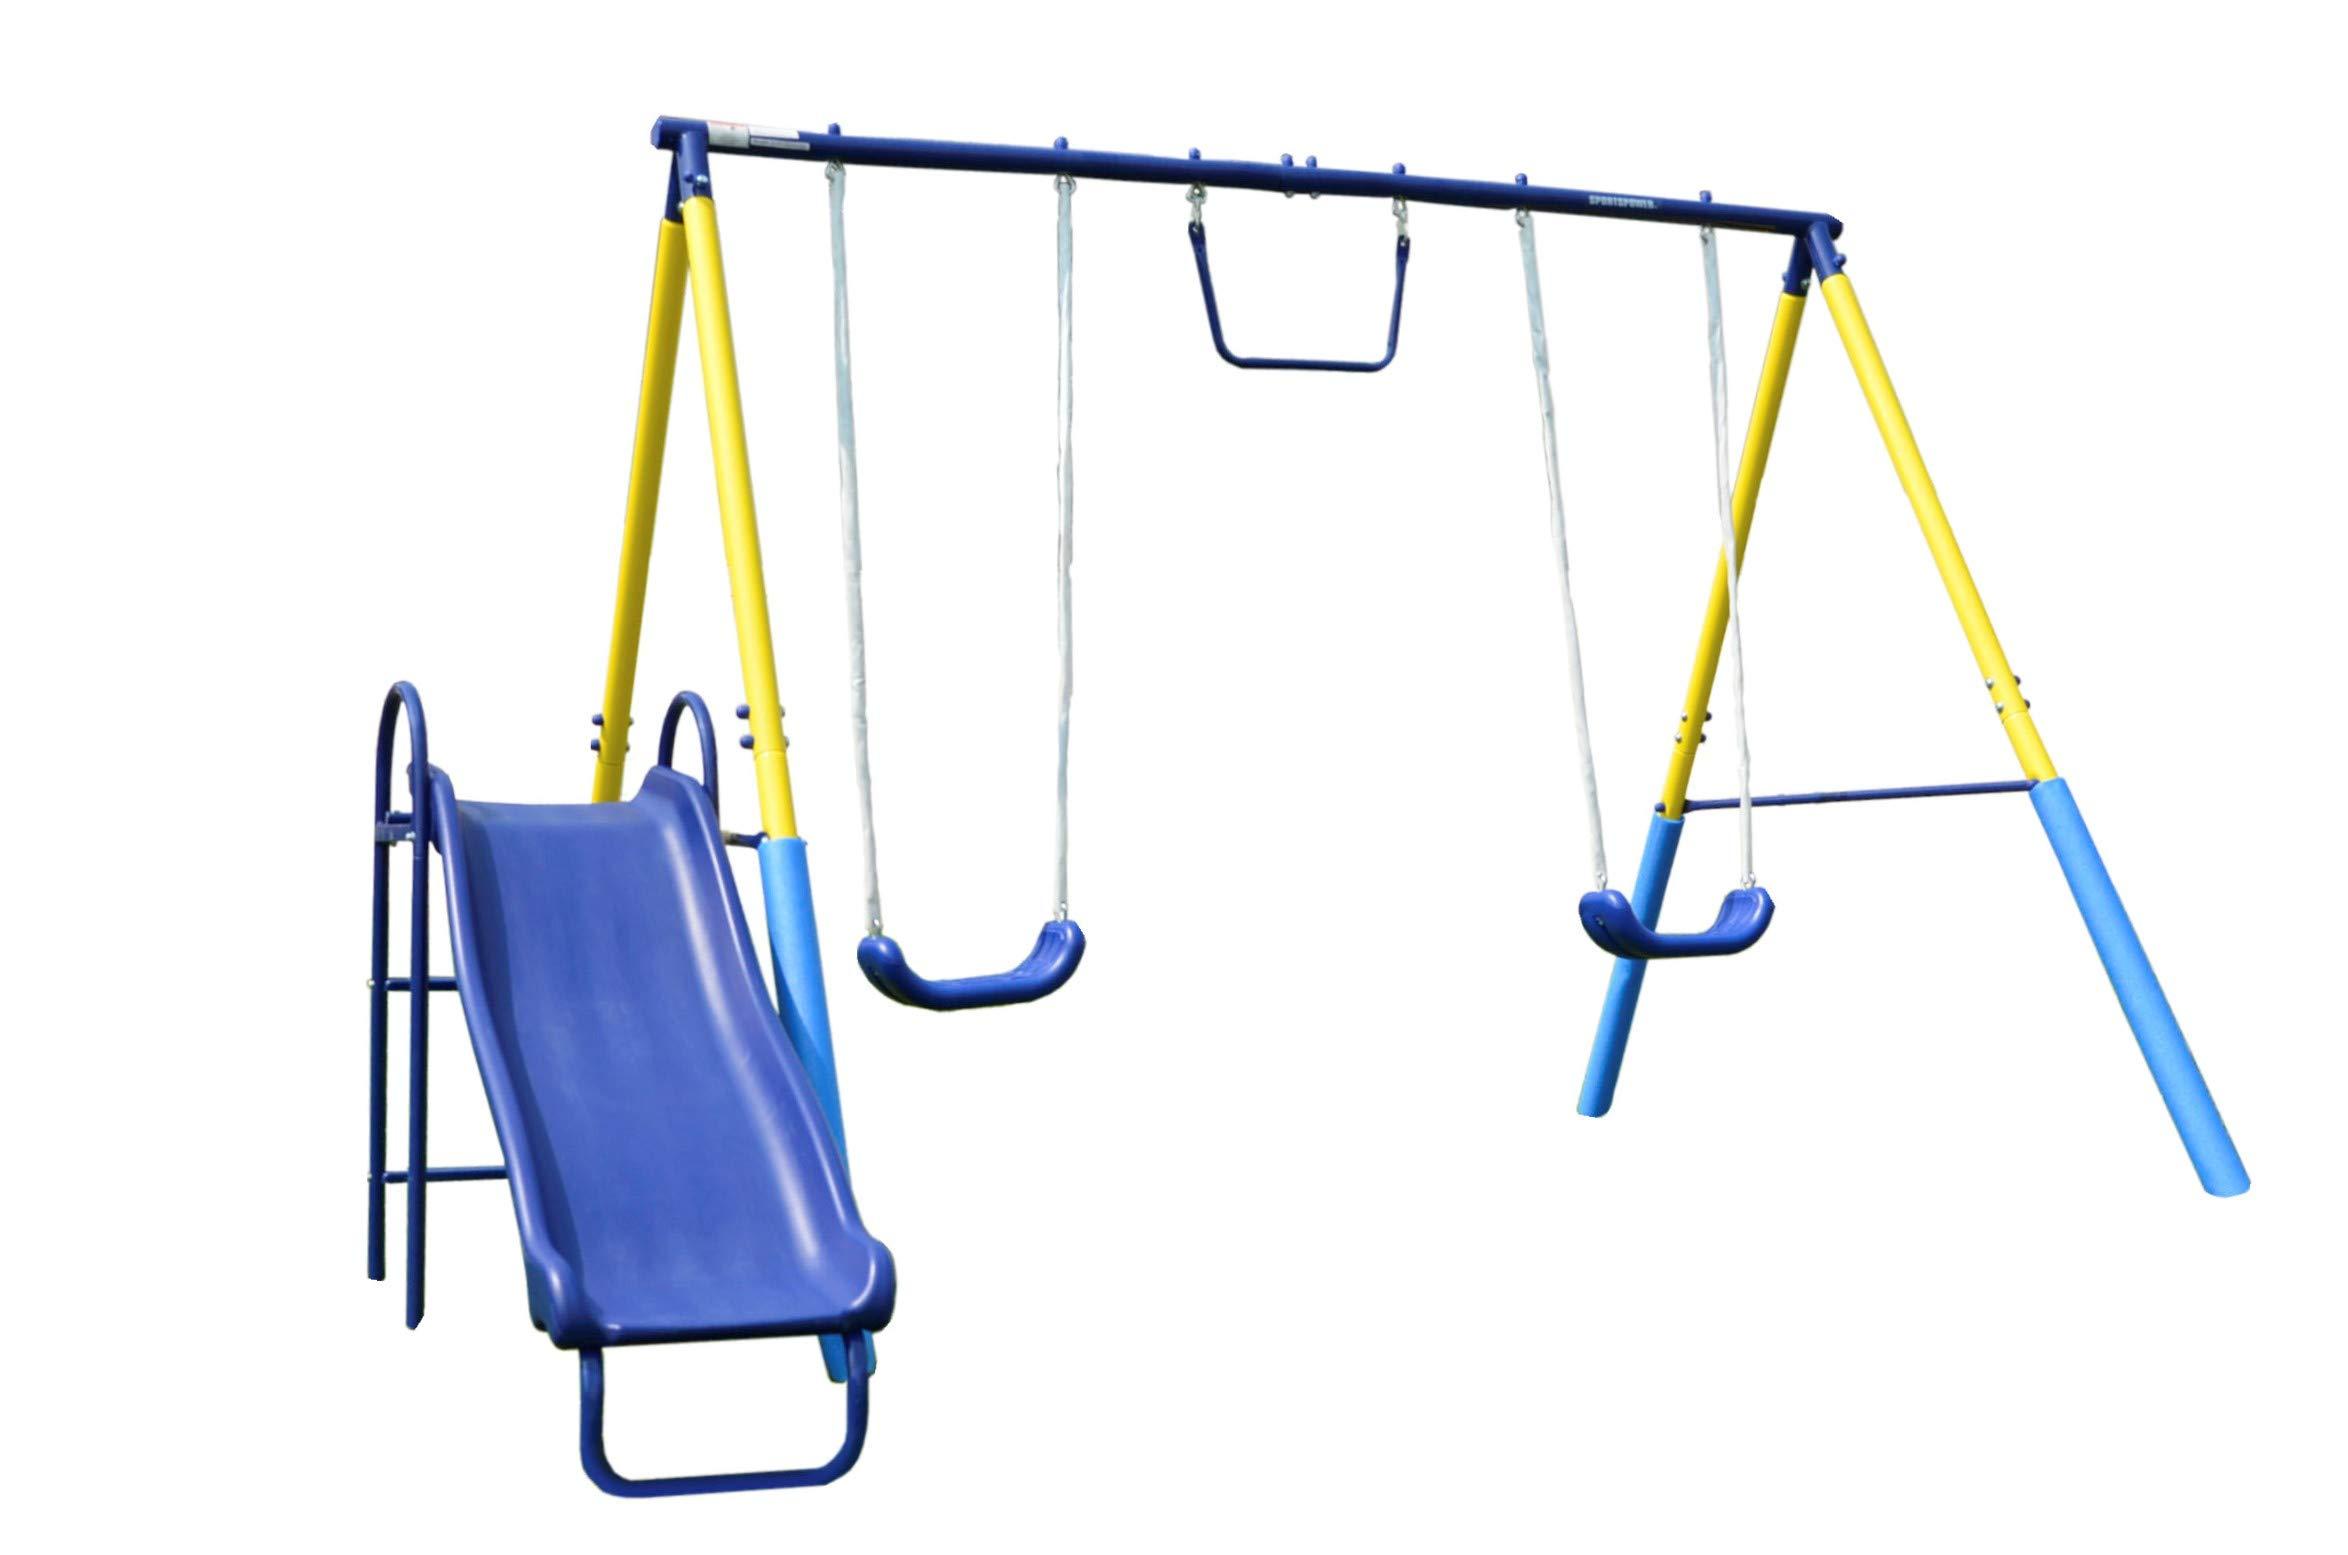 Sportspower My First Metal Swing Set with Slide by Sportspower